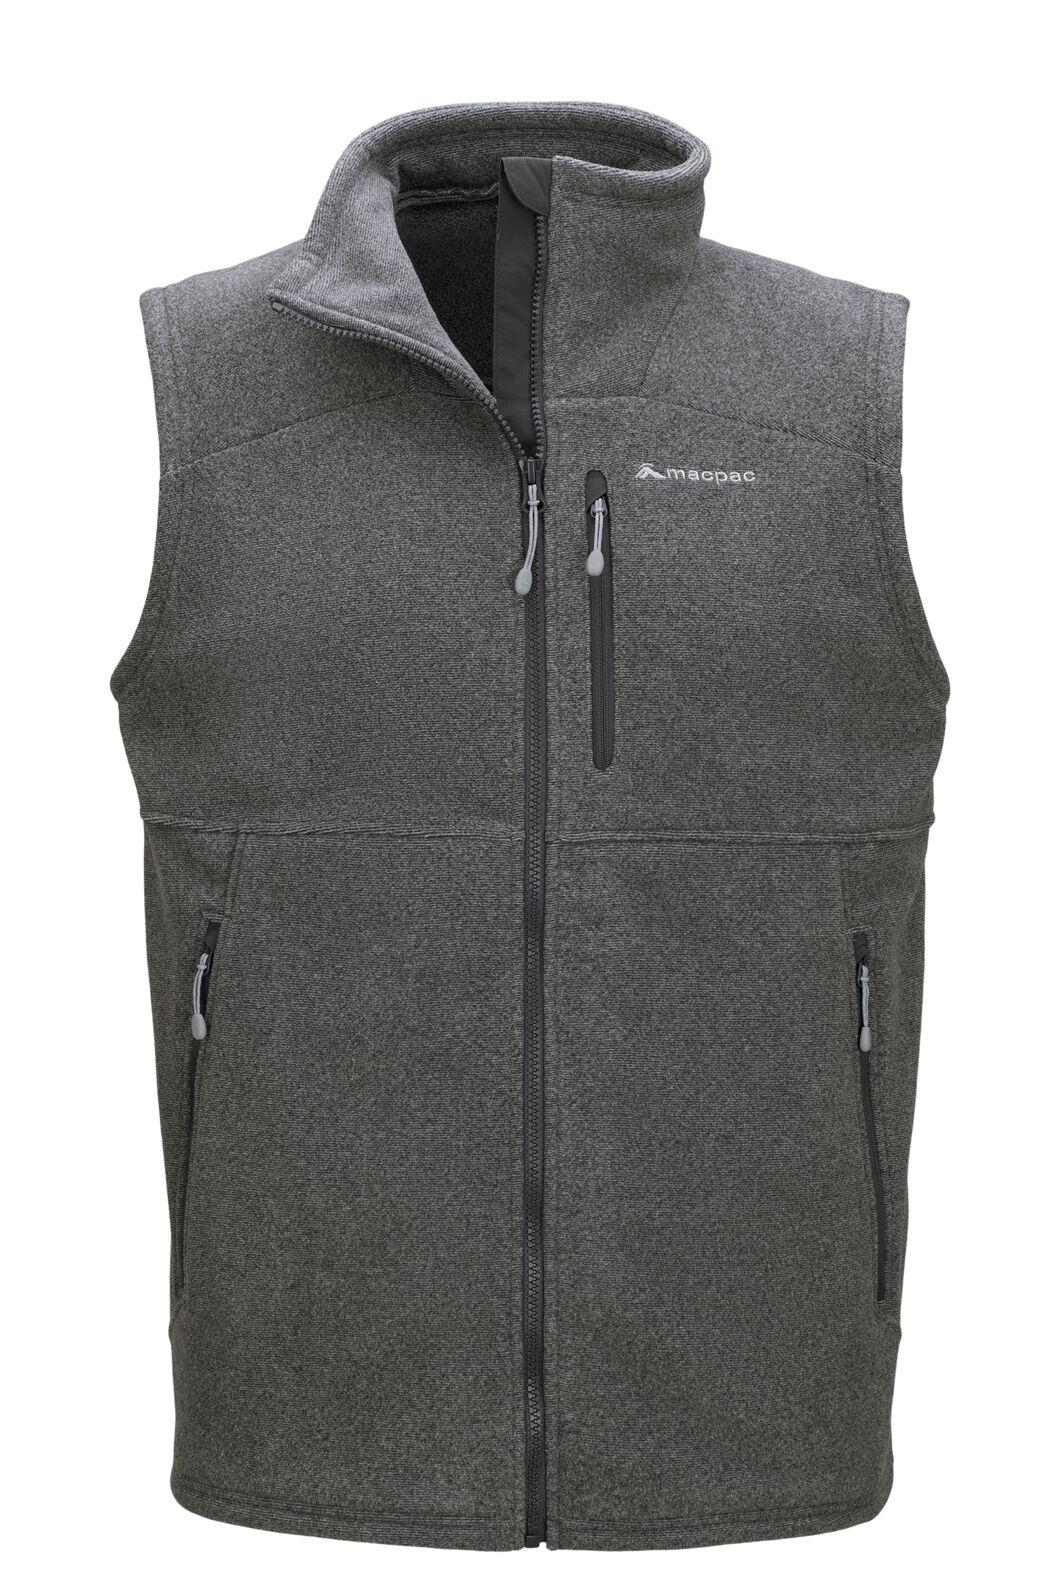 Macpac Men's Dunstan Fleece Vest, Monument/Asphalt, hi-res